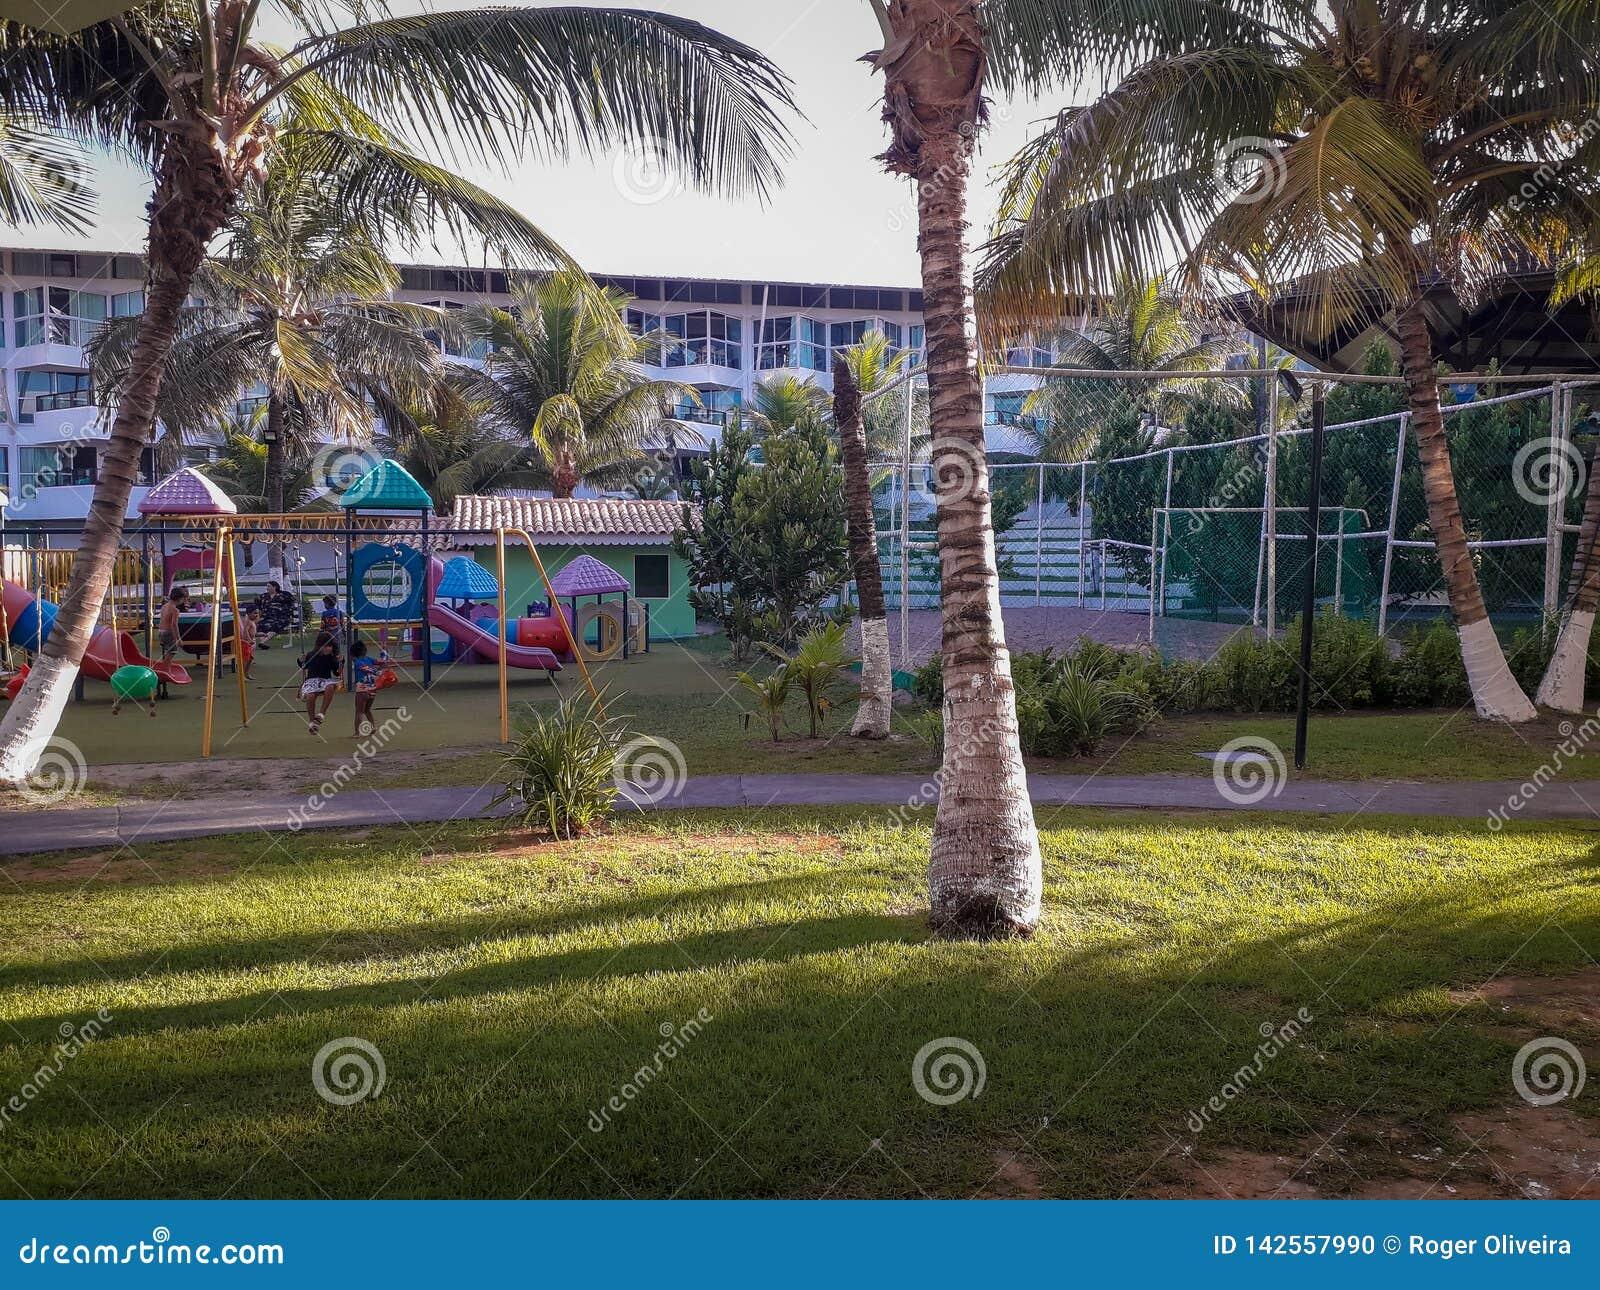 Flat resort on Porto de Galinhas, Pernambuco, Brazil